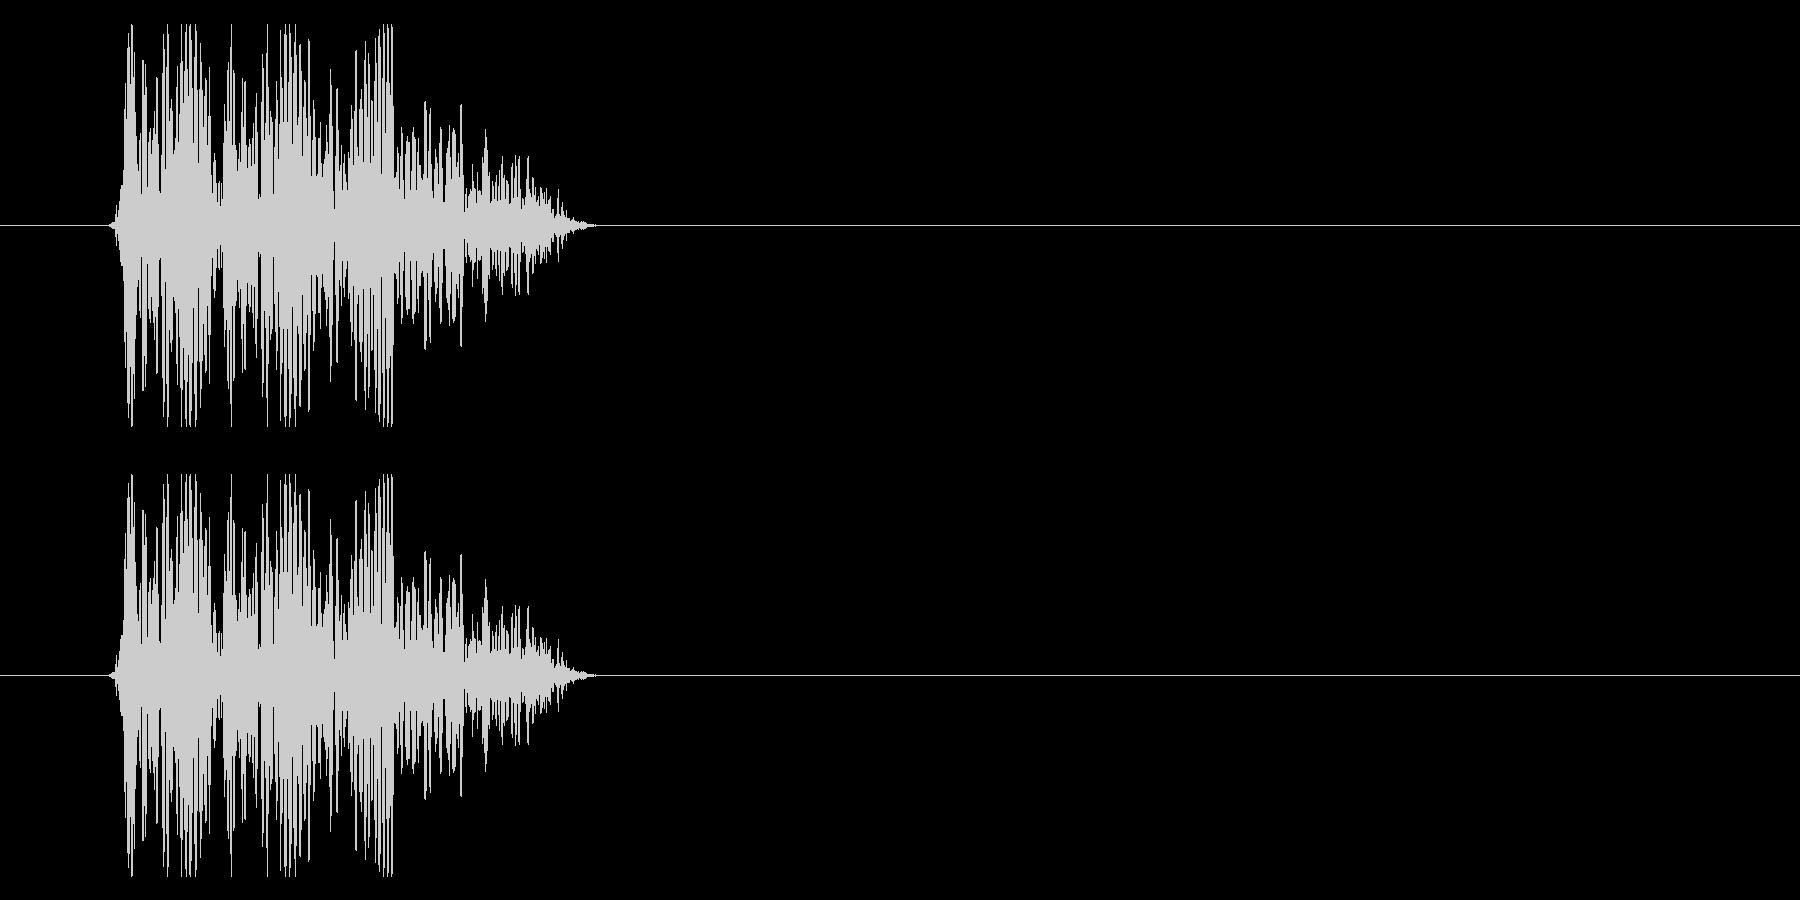 SNES 格闘05-09(倒れる)の未再生の波形